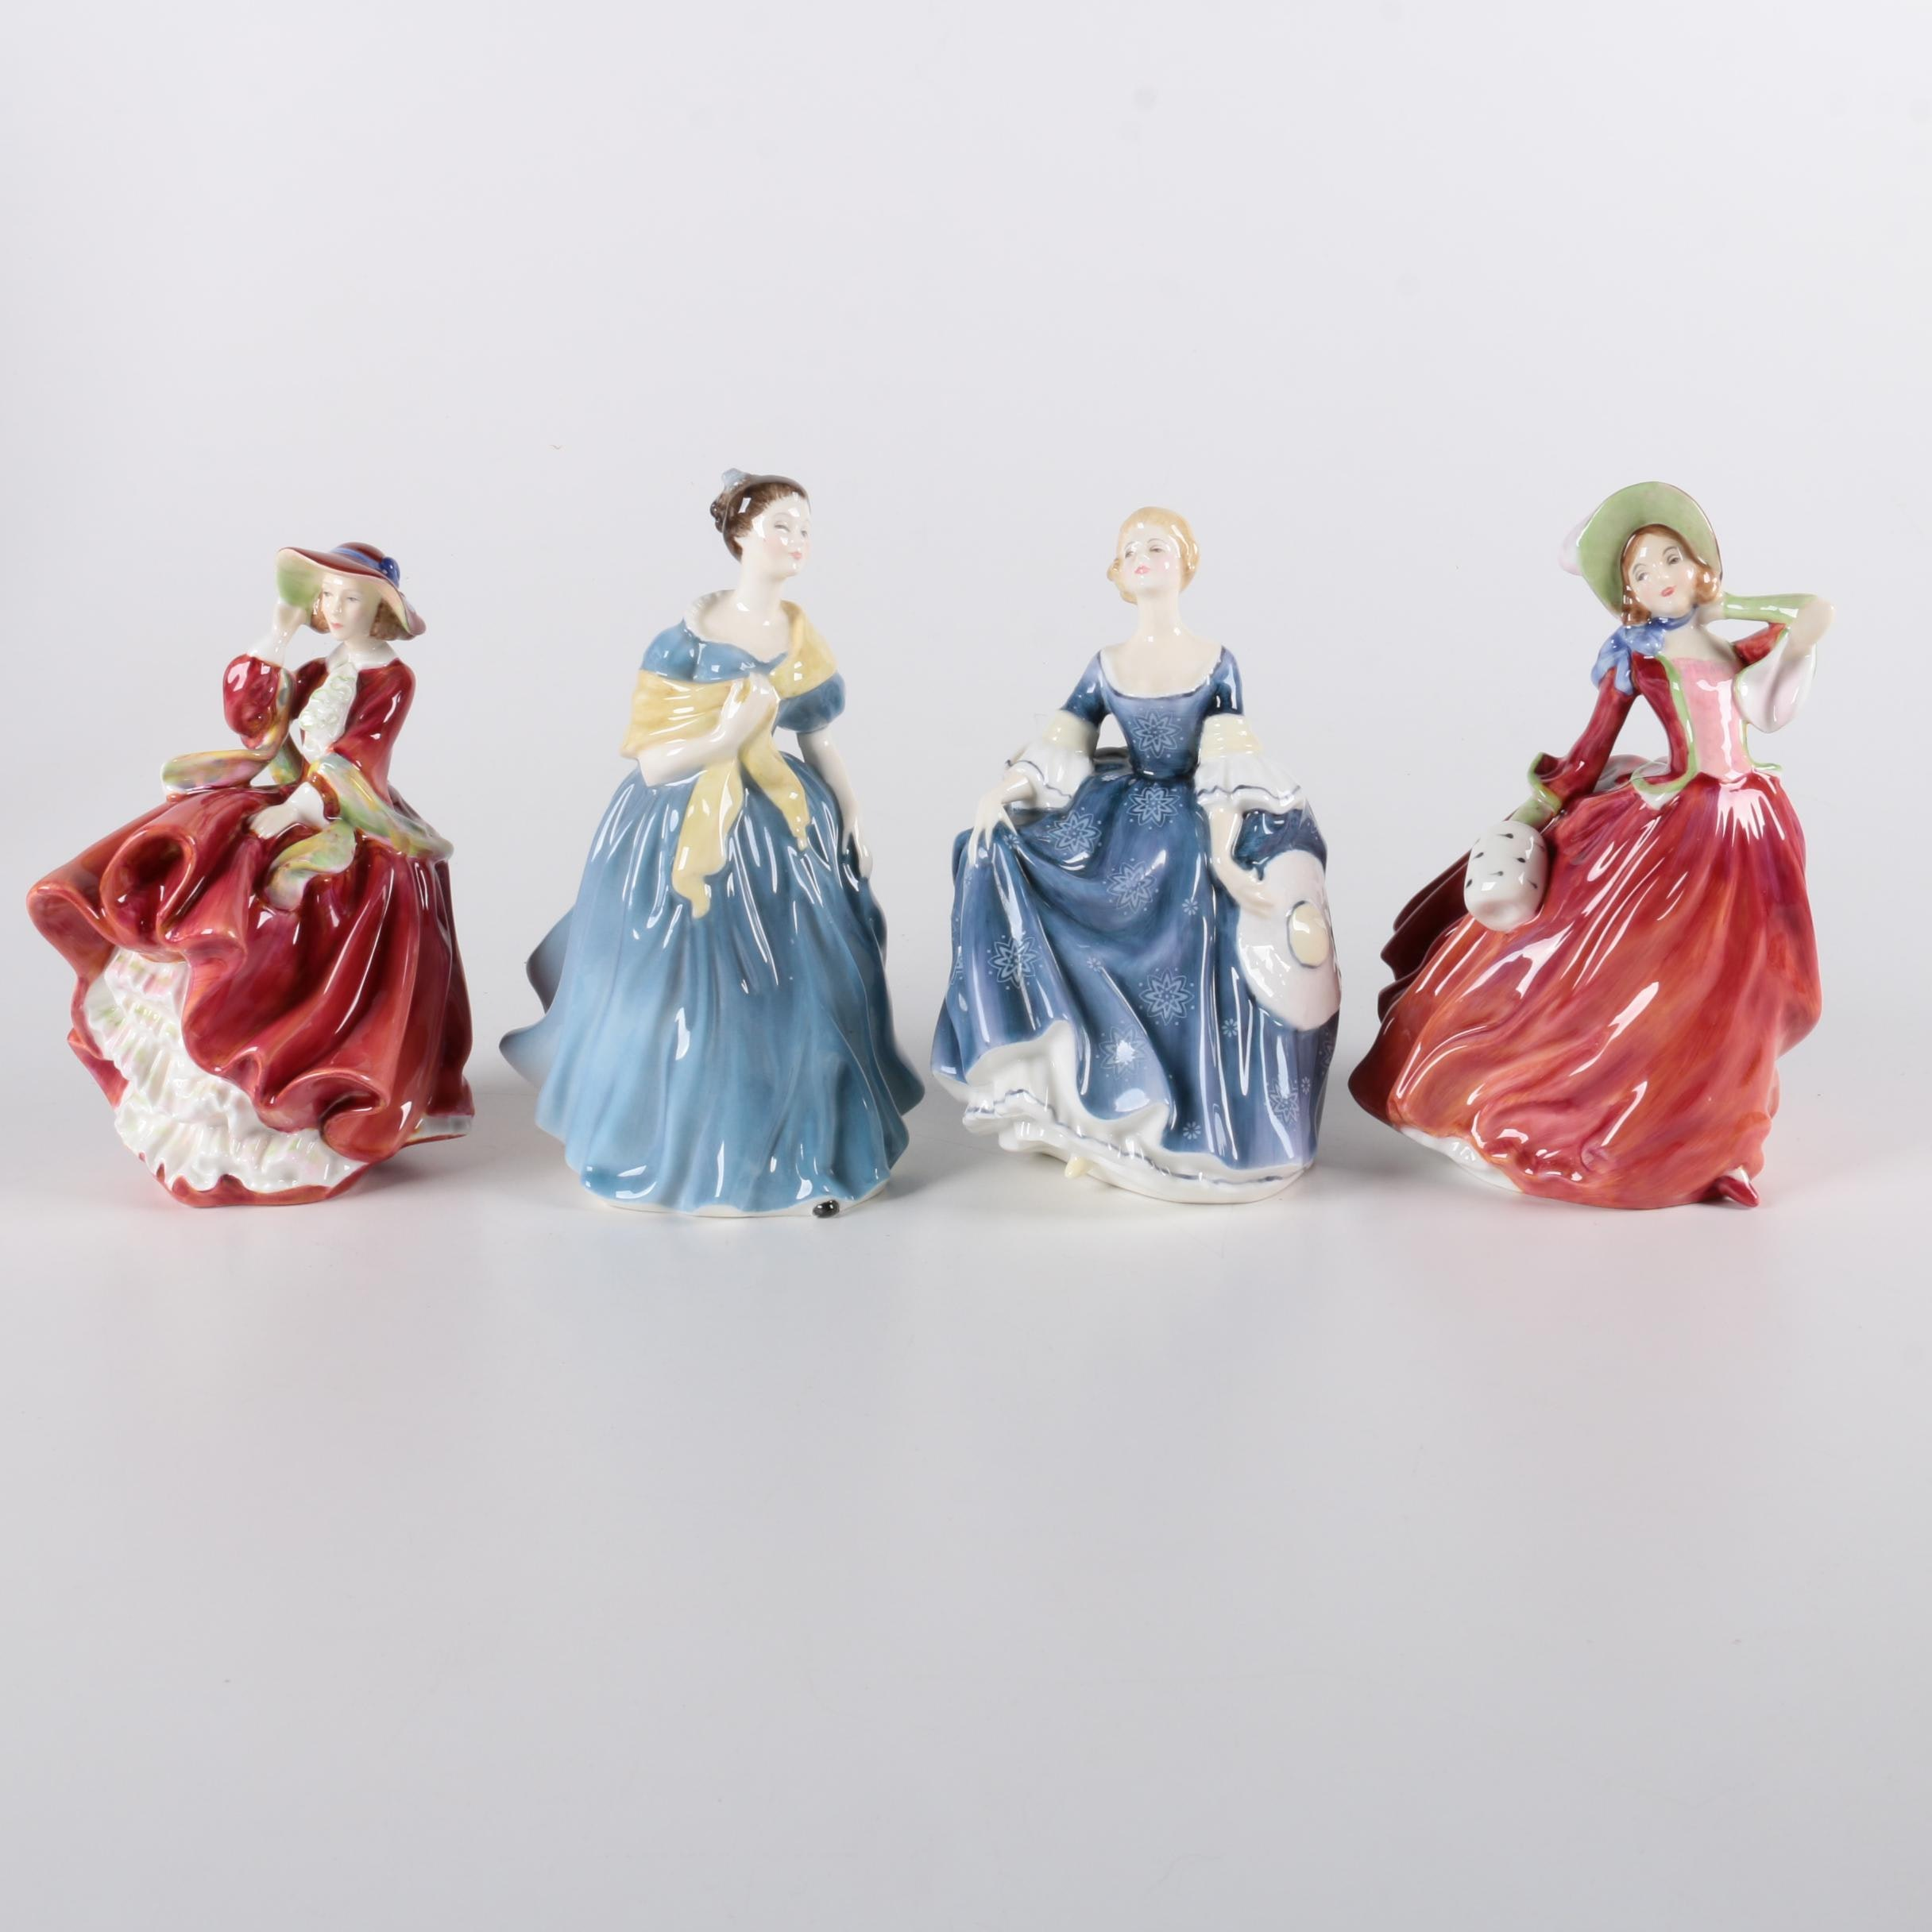 Vintage Royal Doulton Female Figurines